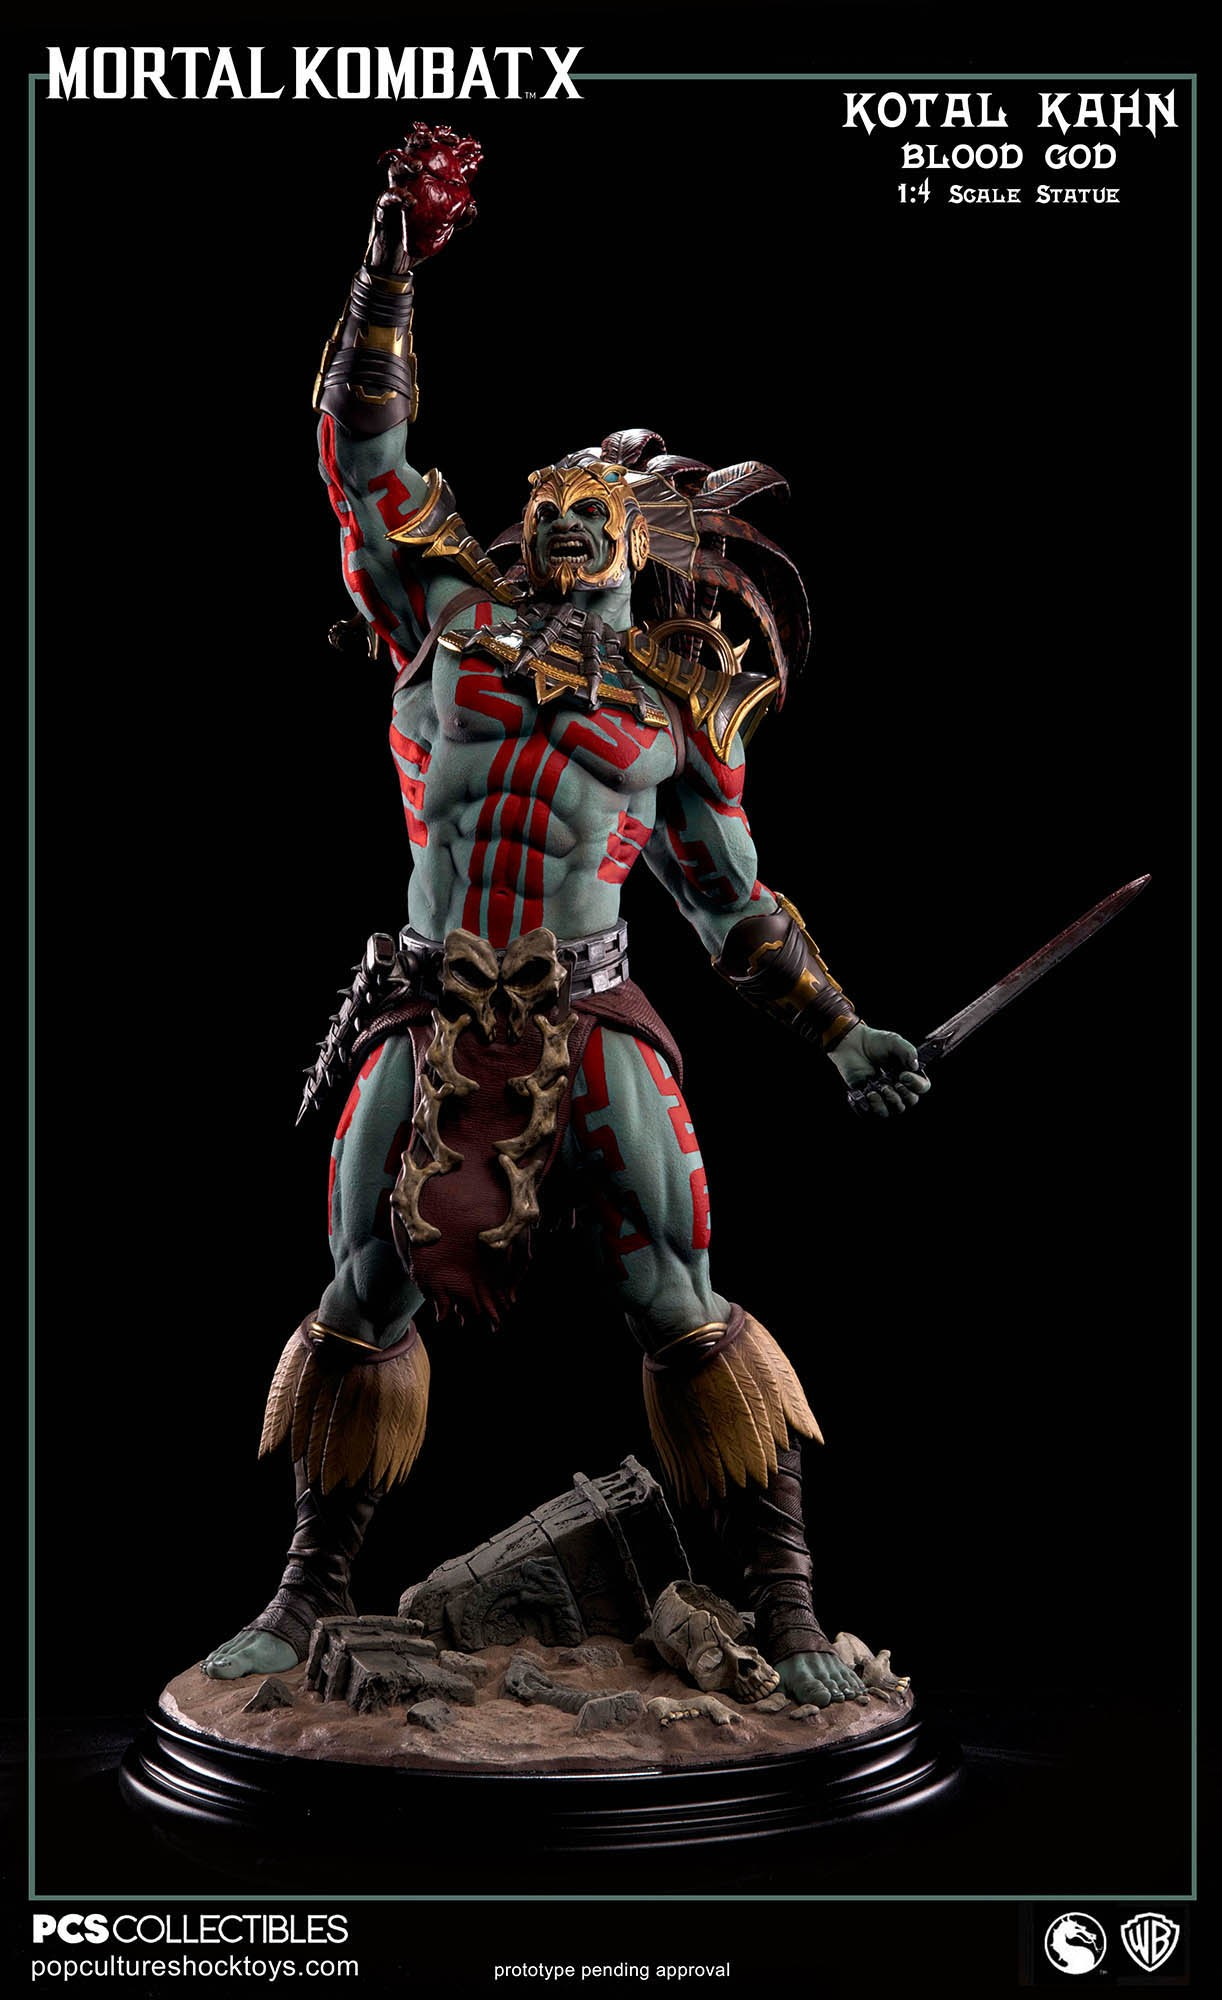 [Pop Culture Shock] Mortal Kombat X: Kotal Kahn 1:4 scale PCS-Kotal-Kahn-Blood-God-004